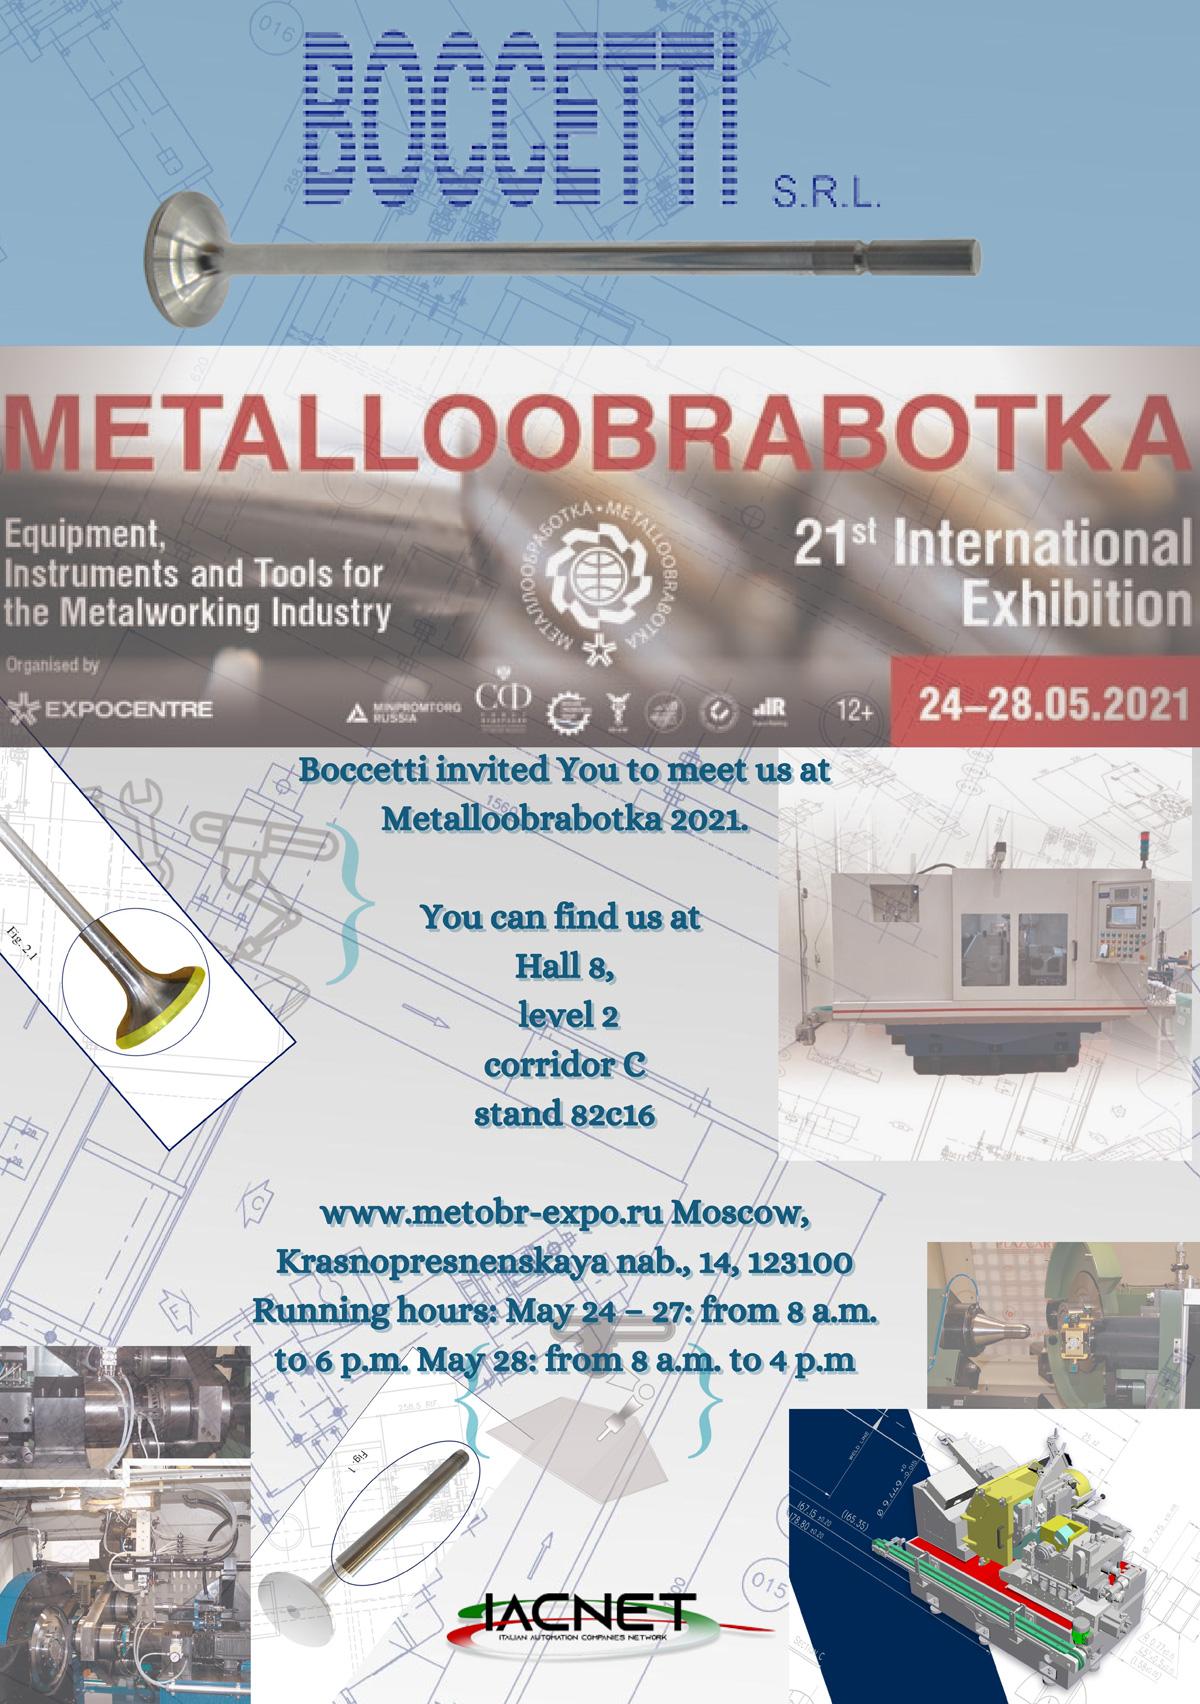 24 - 28 Maggio | Metalloobrabotka 2021